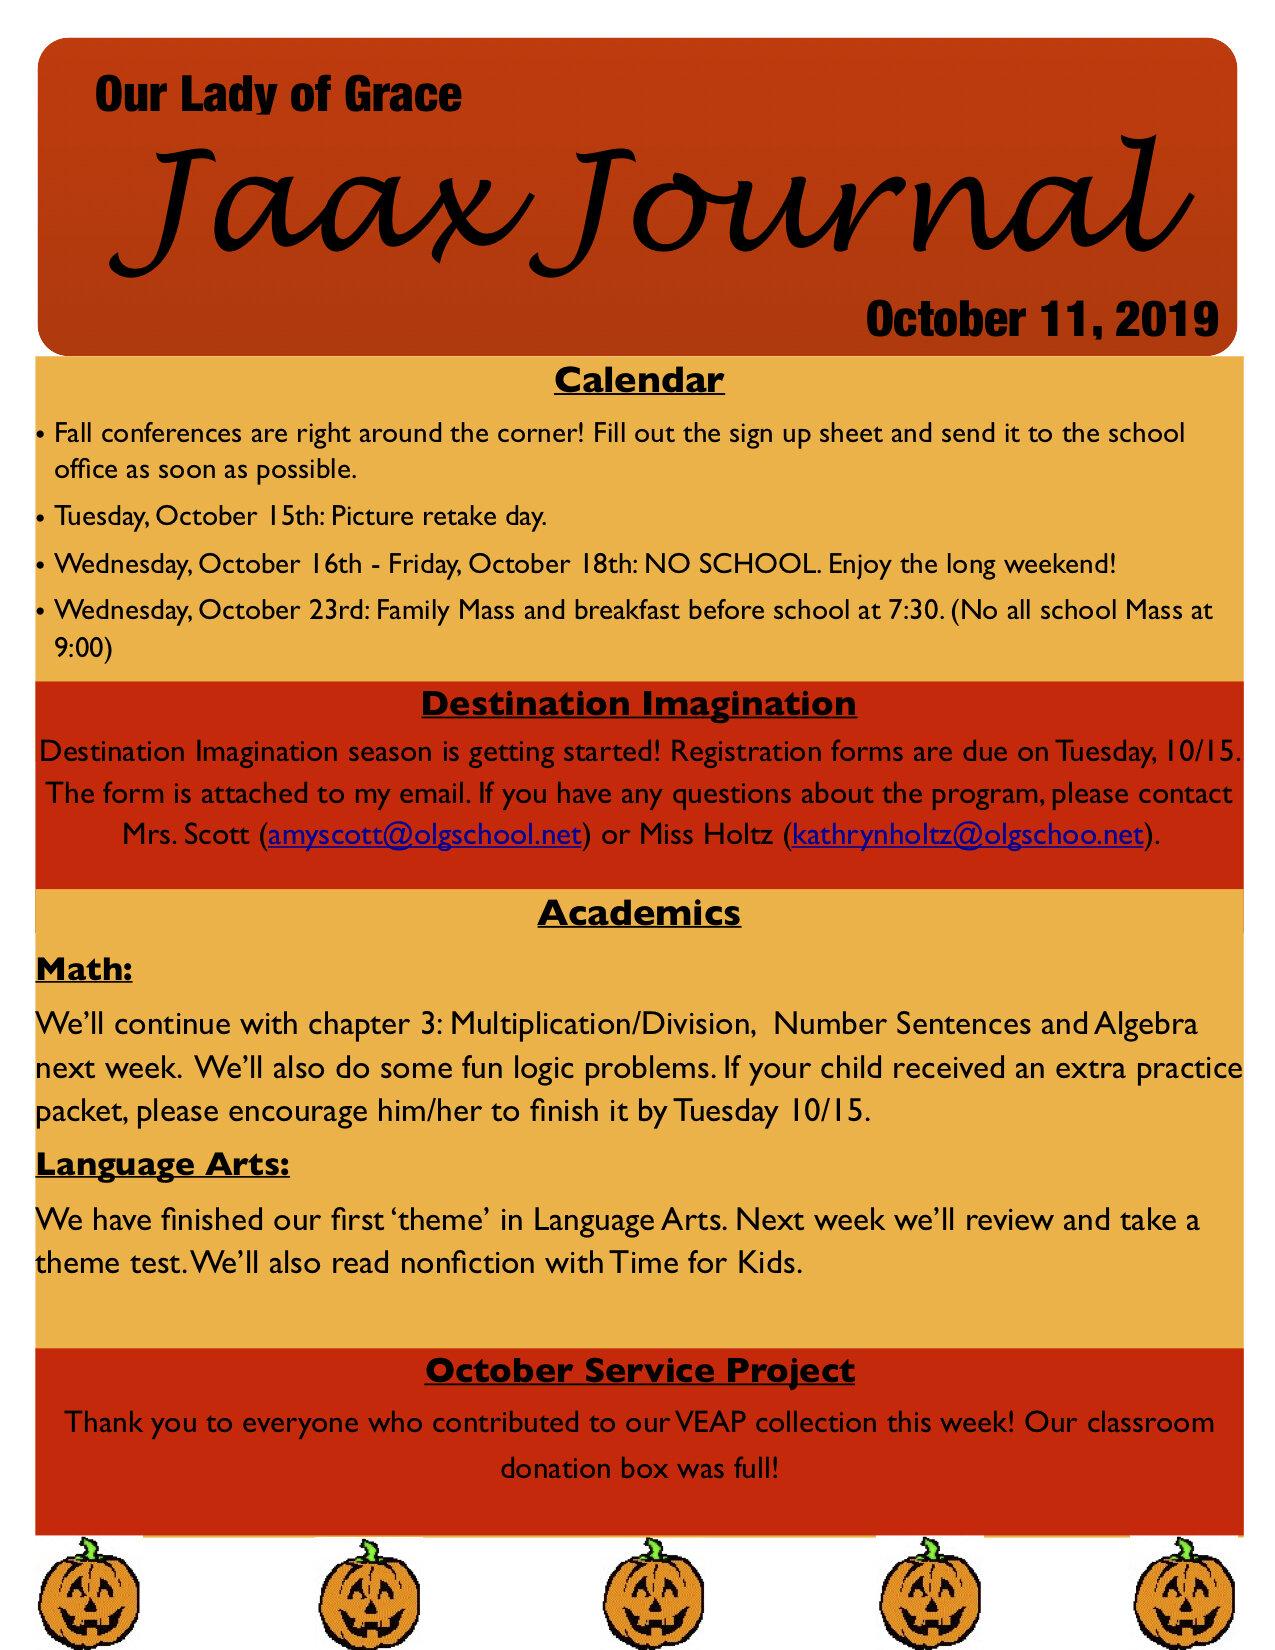 JaaxJournal10-11-19.jpg